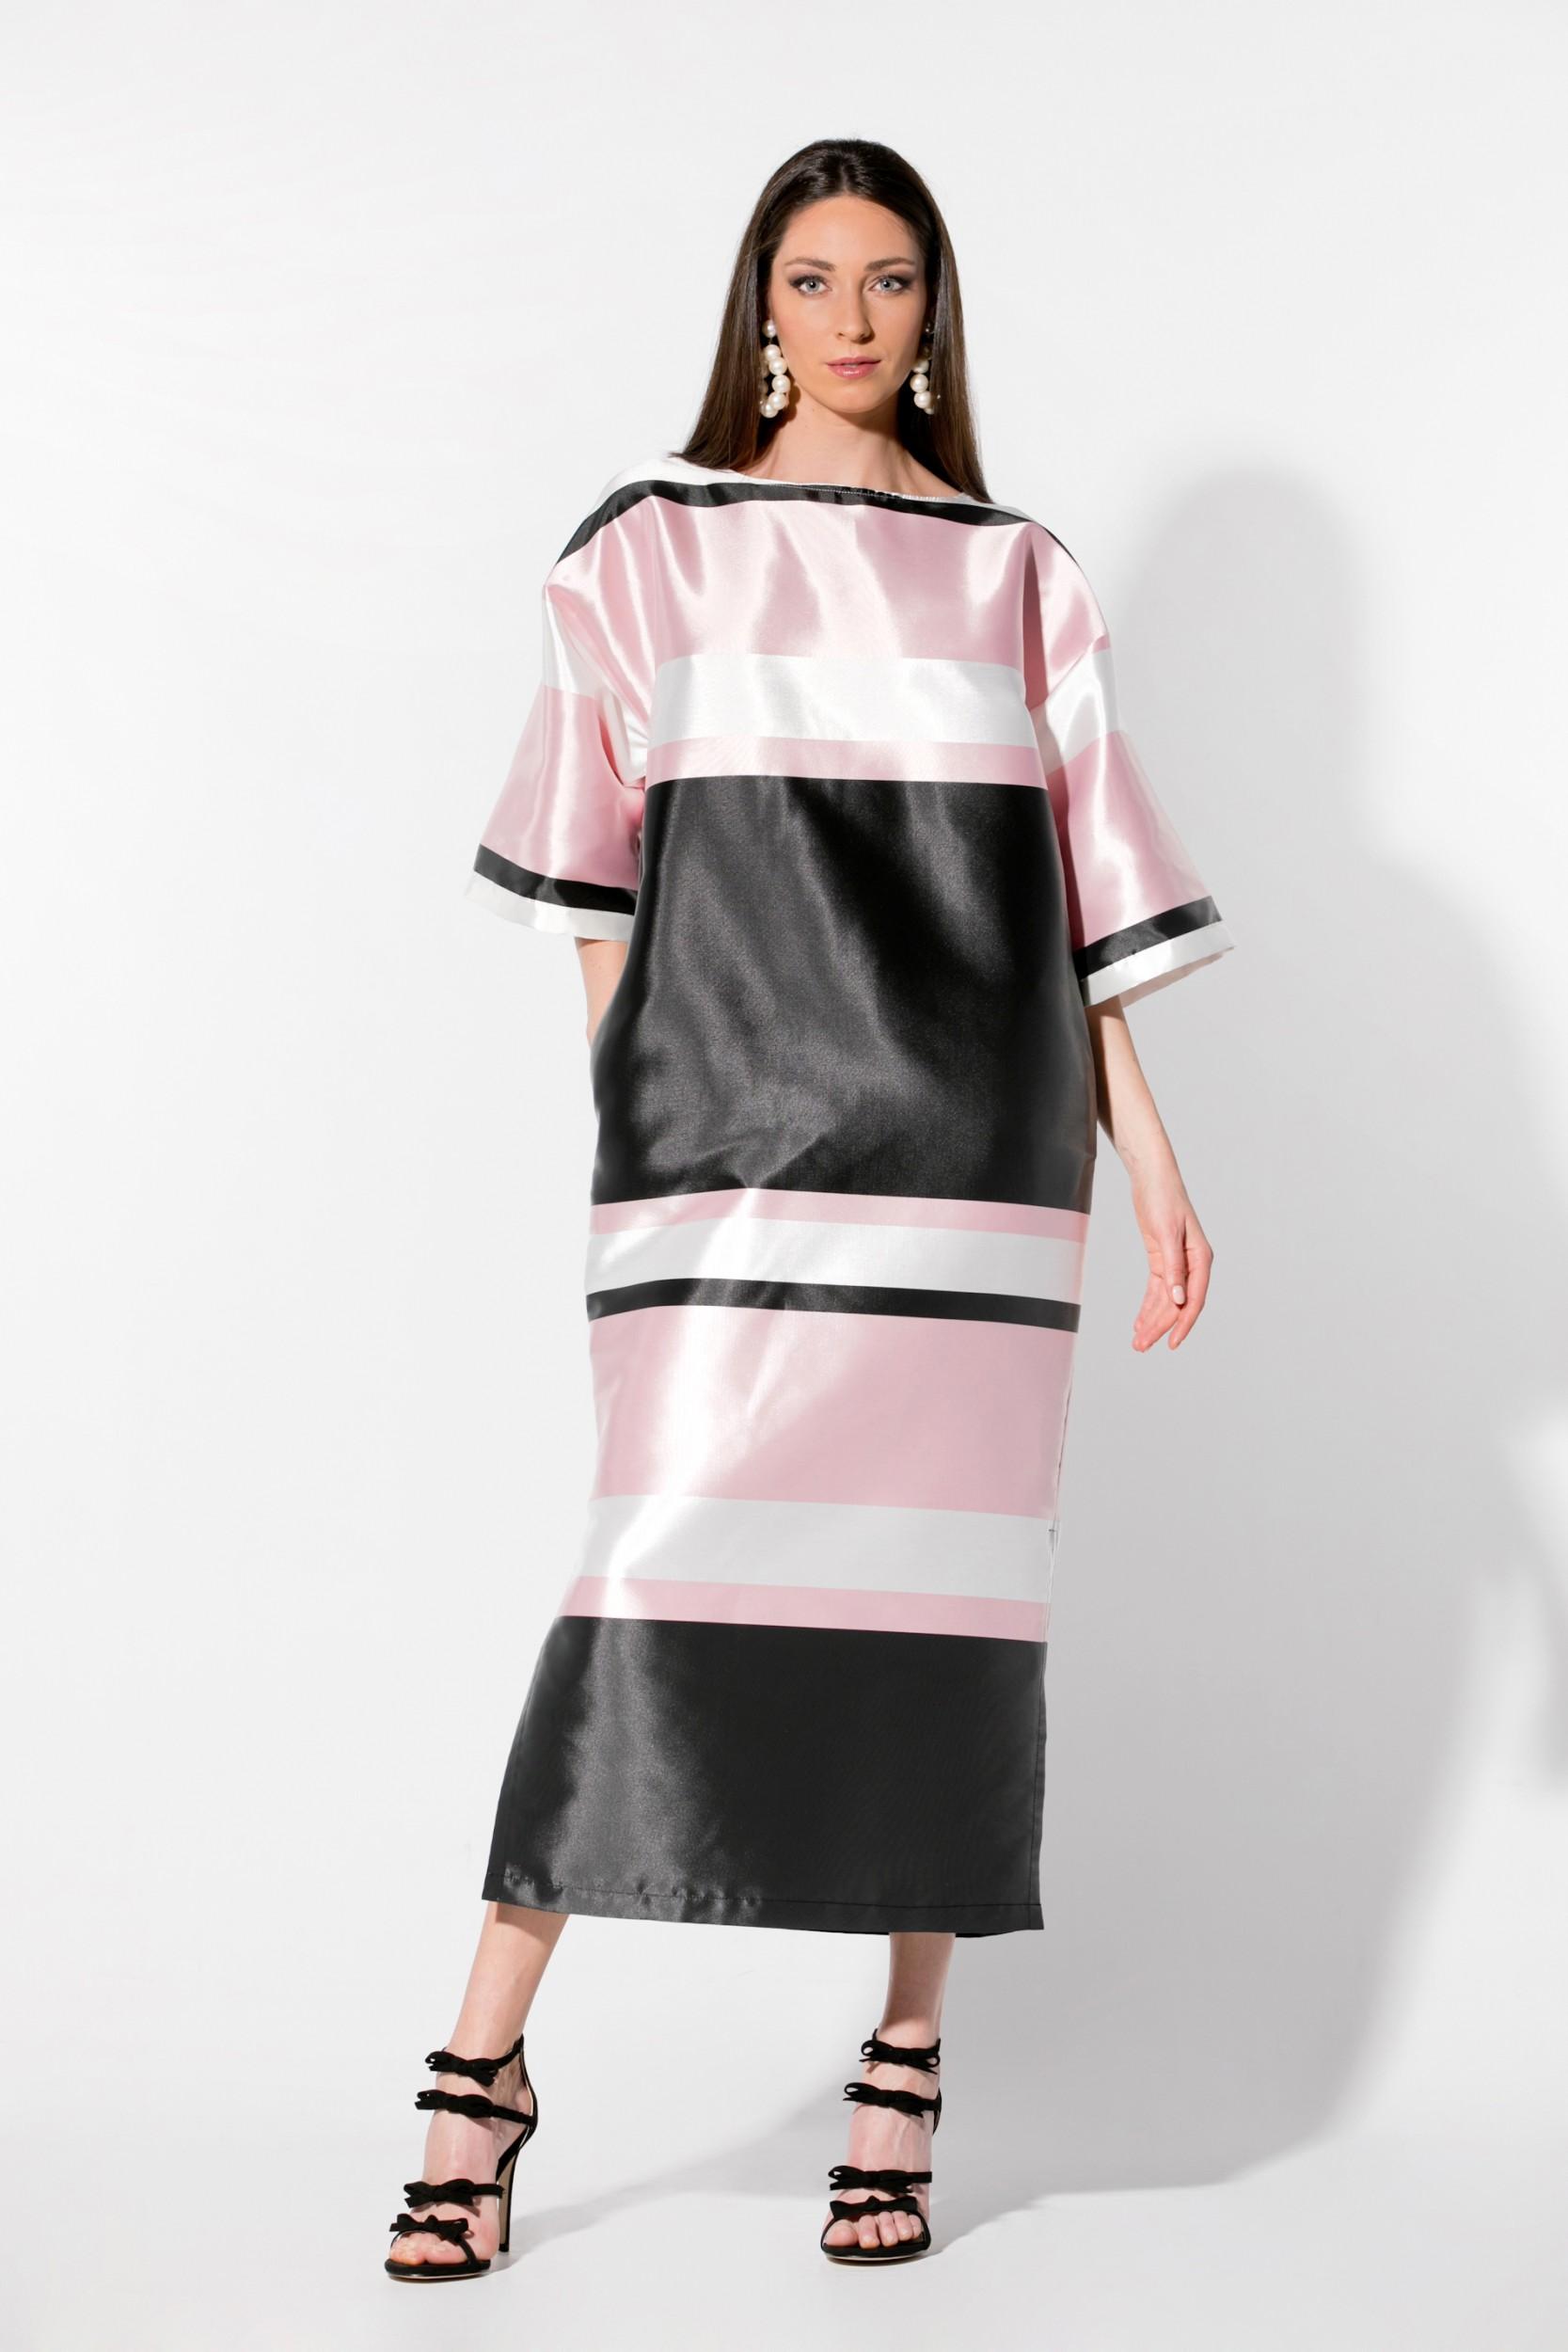 Cherry Blossoms Dresses | Elegant dress/ dress/ dressing gown ...